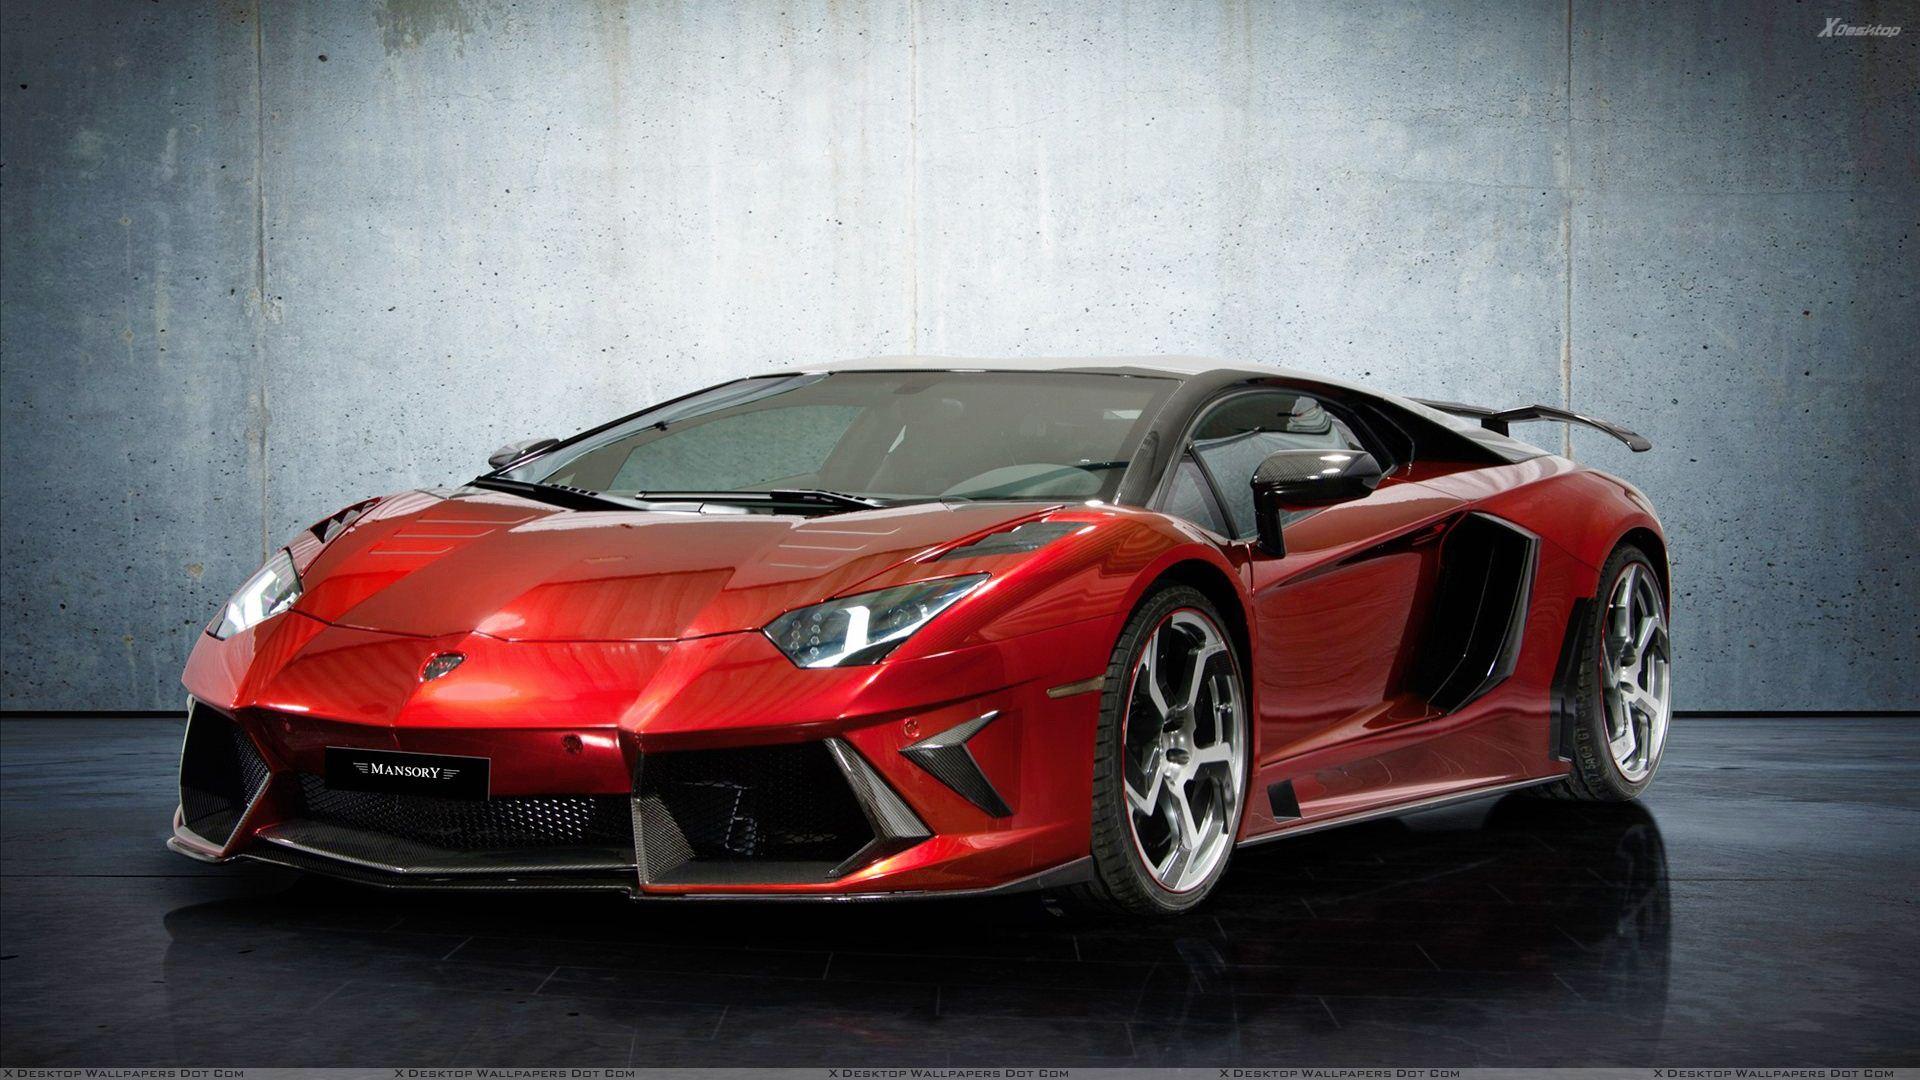 Lamborghini Aventador red #1